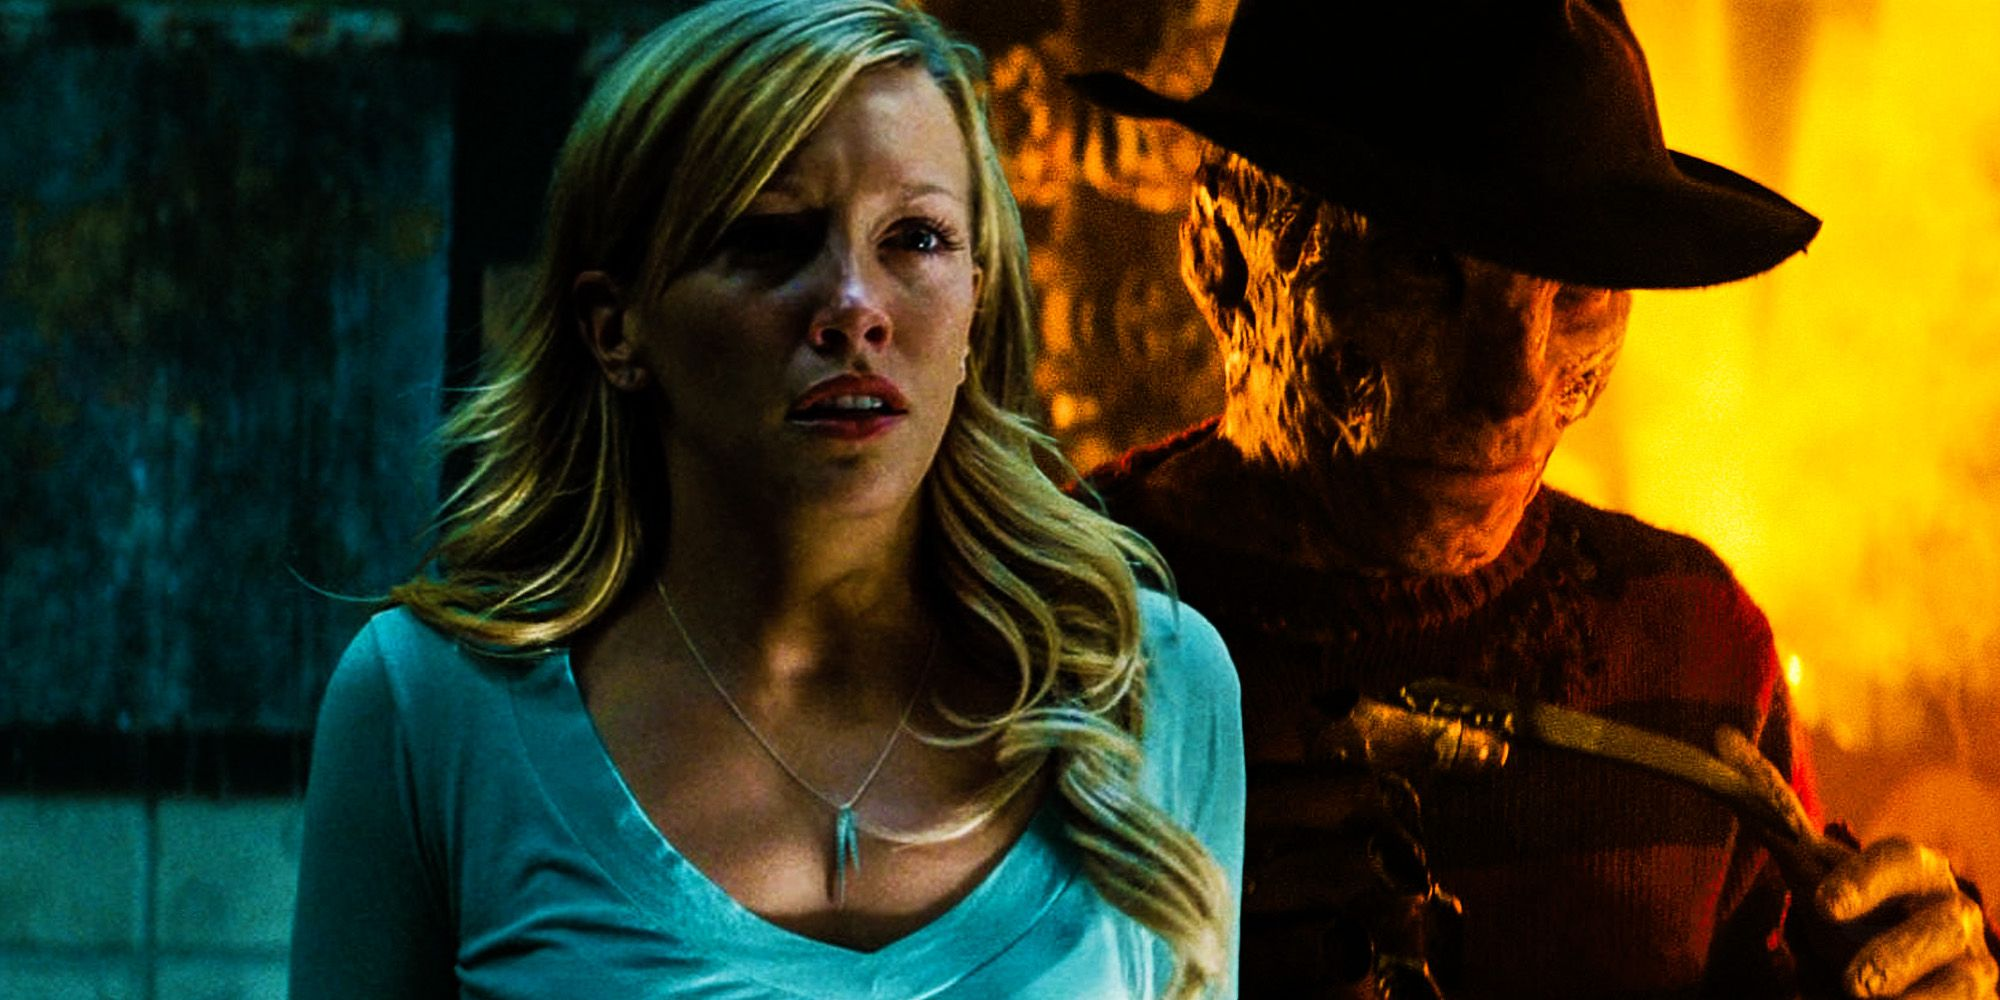 The Nightmare On Elm St Remake Cut Its Best Freddy Krueger Scare